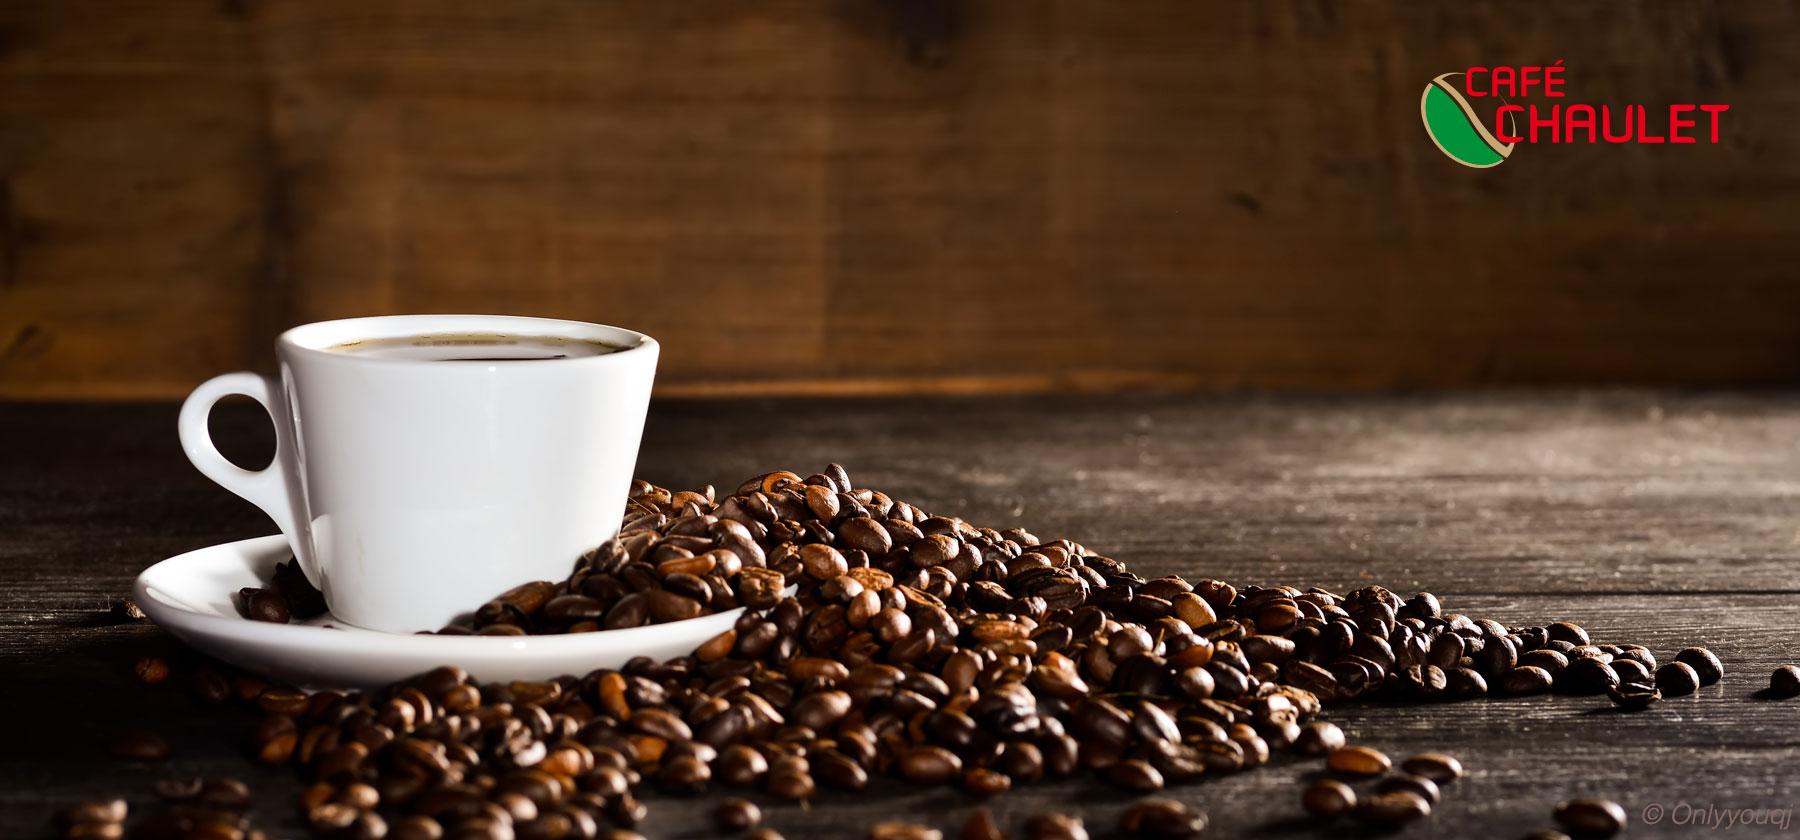 cafe chaulet torrefaction guadeloupe